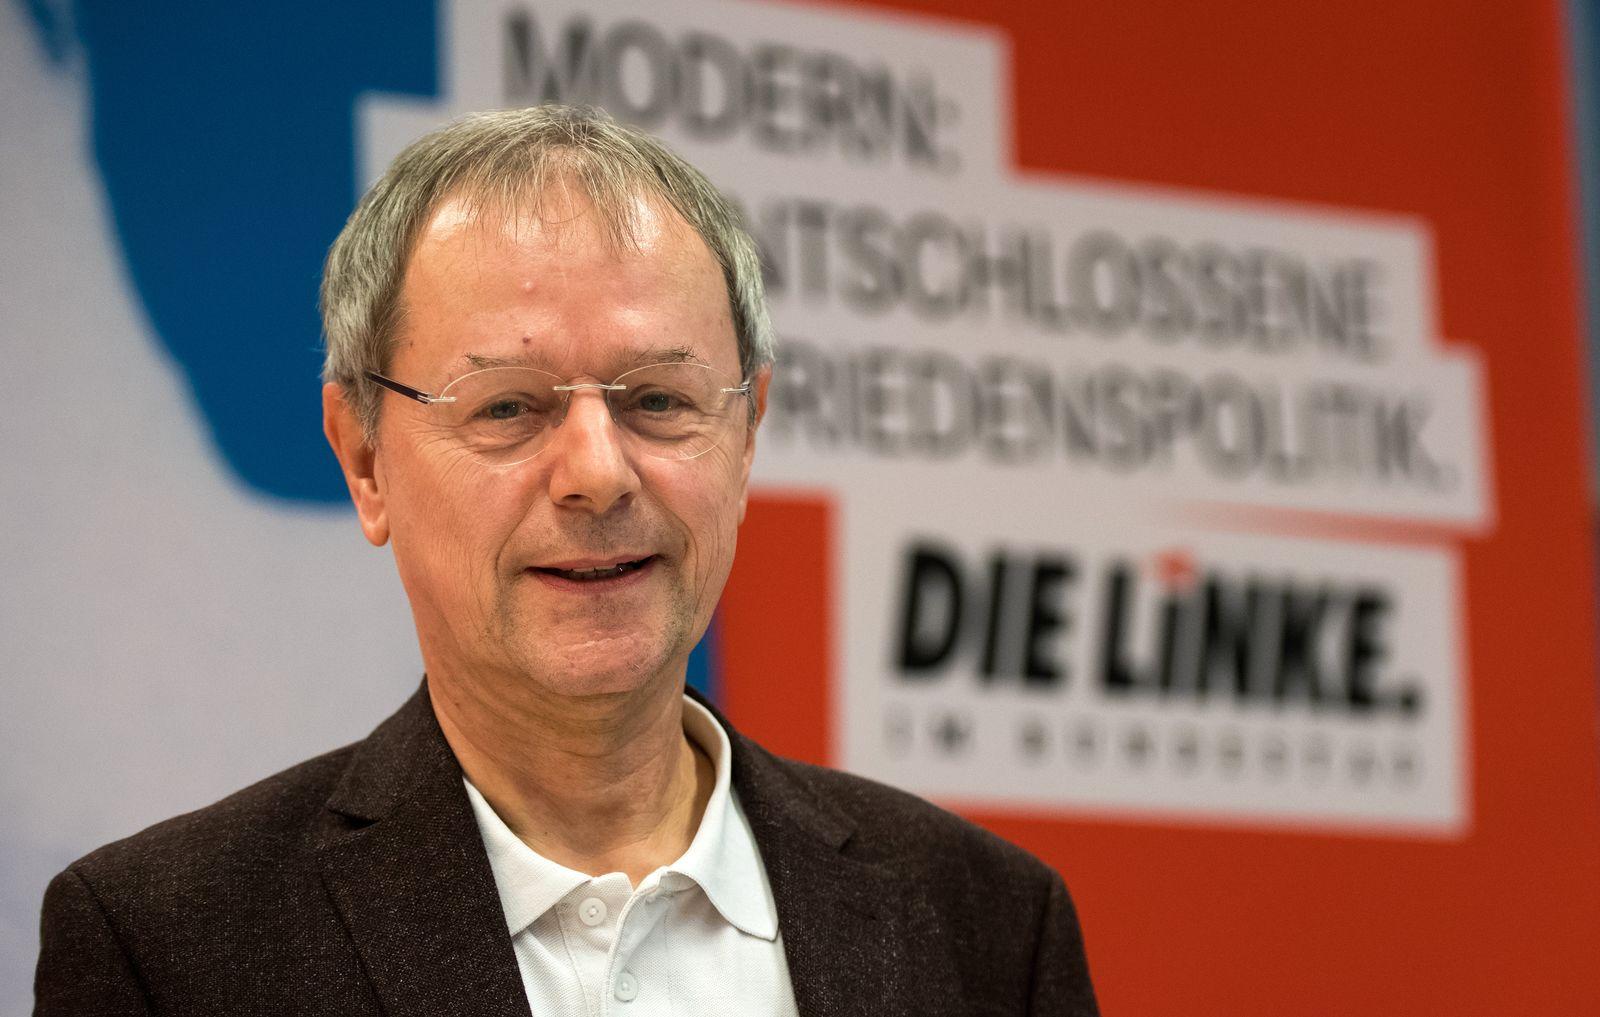 Linke-Bundespräsidentschaftskandidat Butterwegge